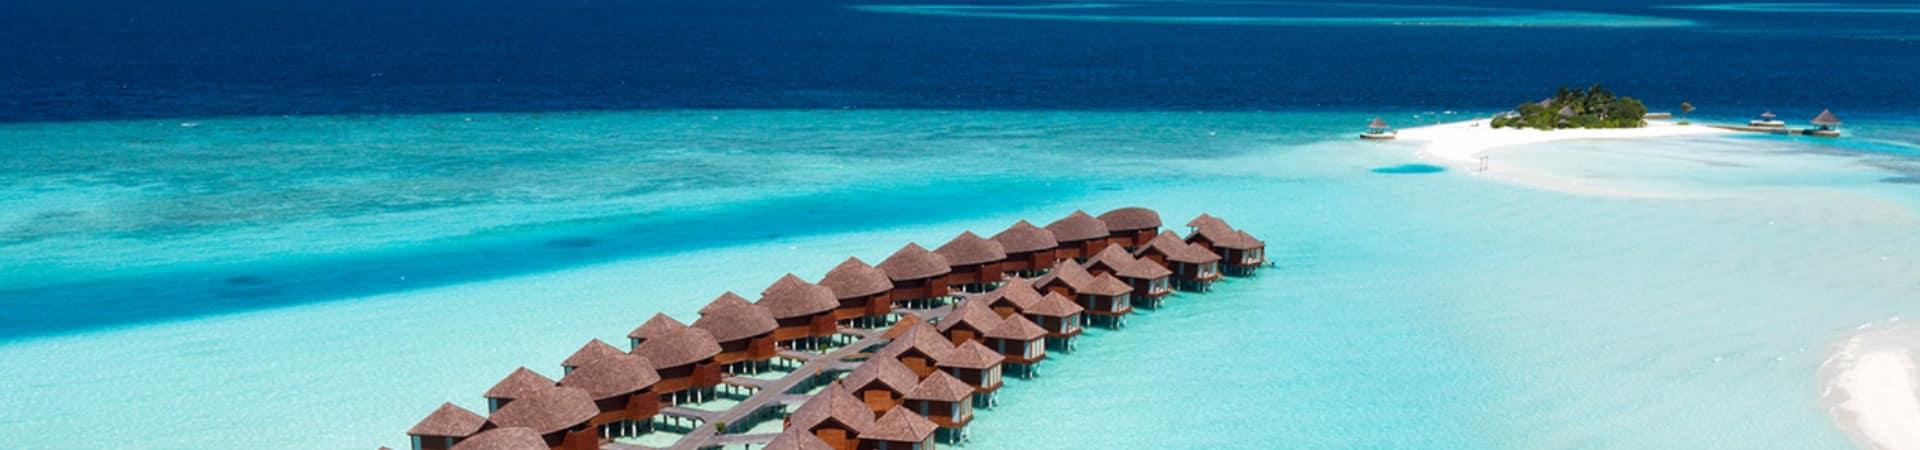 Bangalôs no Anantara Dhigu Maldives